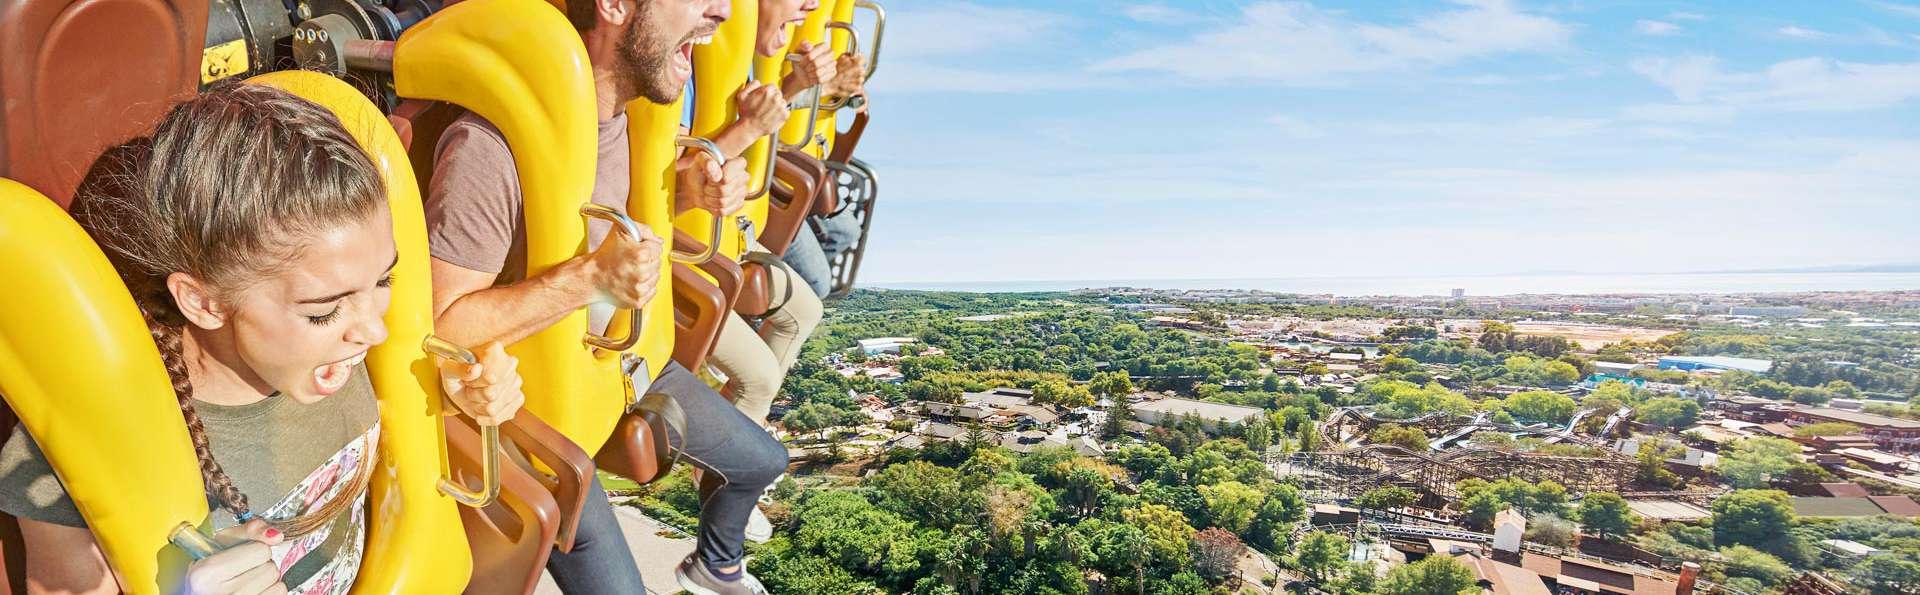 Séjour à Tarragona avec tickets à Portaventura